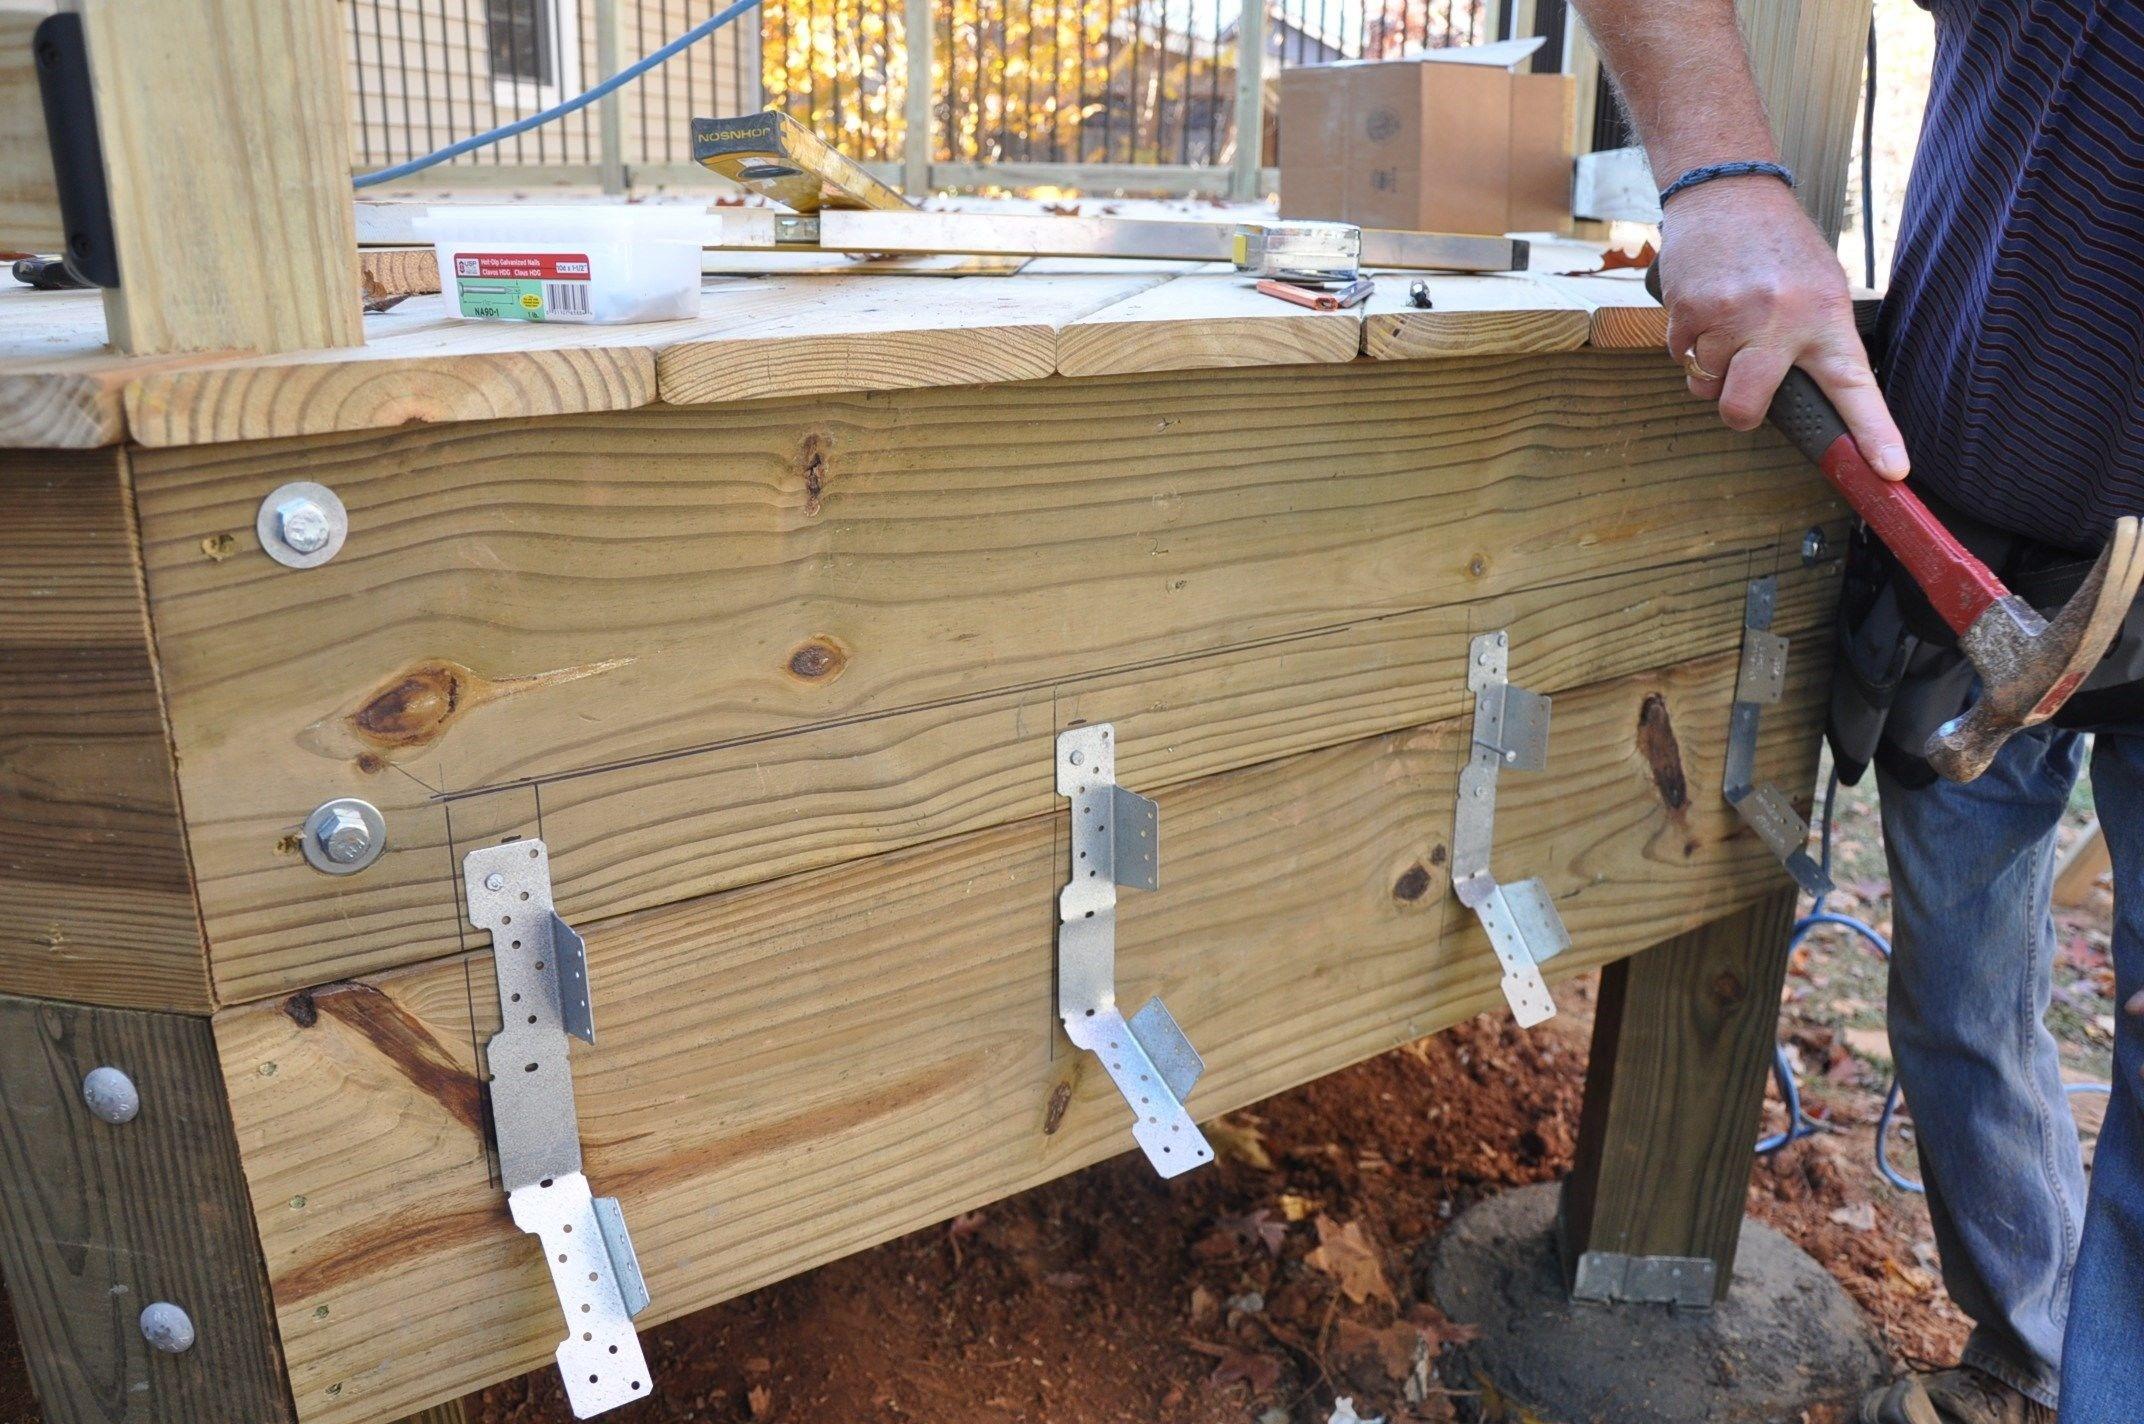 Stair Stringer Attachment Decks Com | Best Wood For Stair Stringers | Primer | Stair Railing | Deck | Porch | Deck Stairs